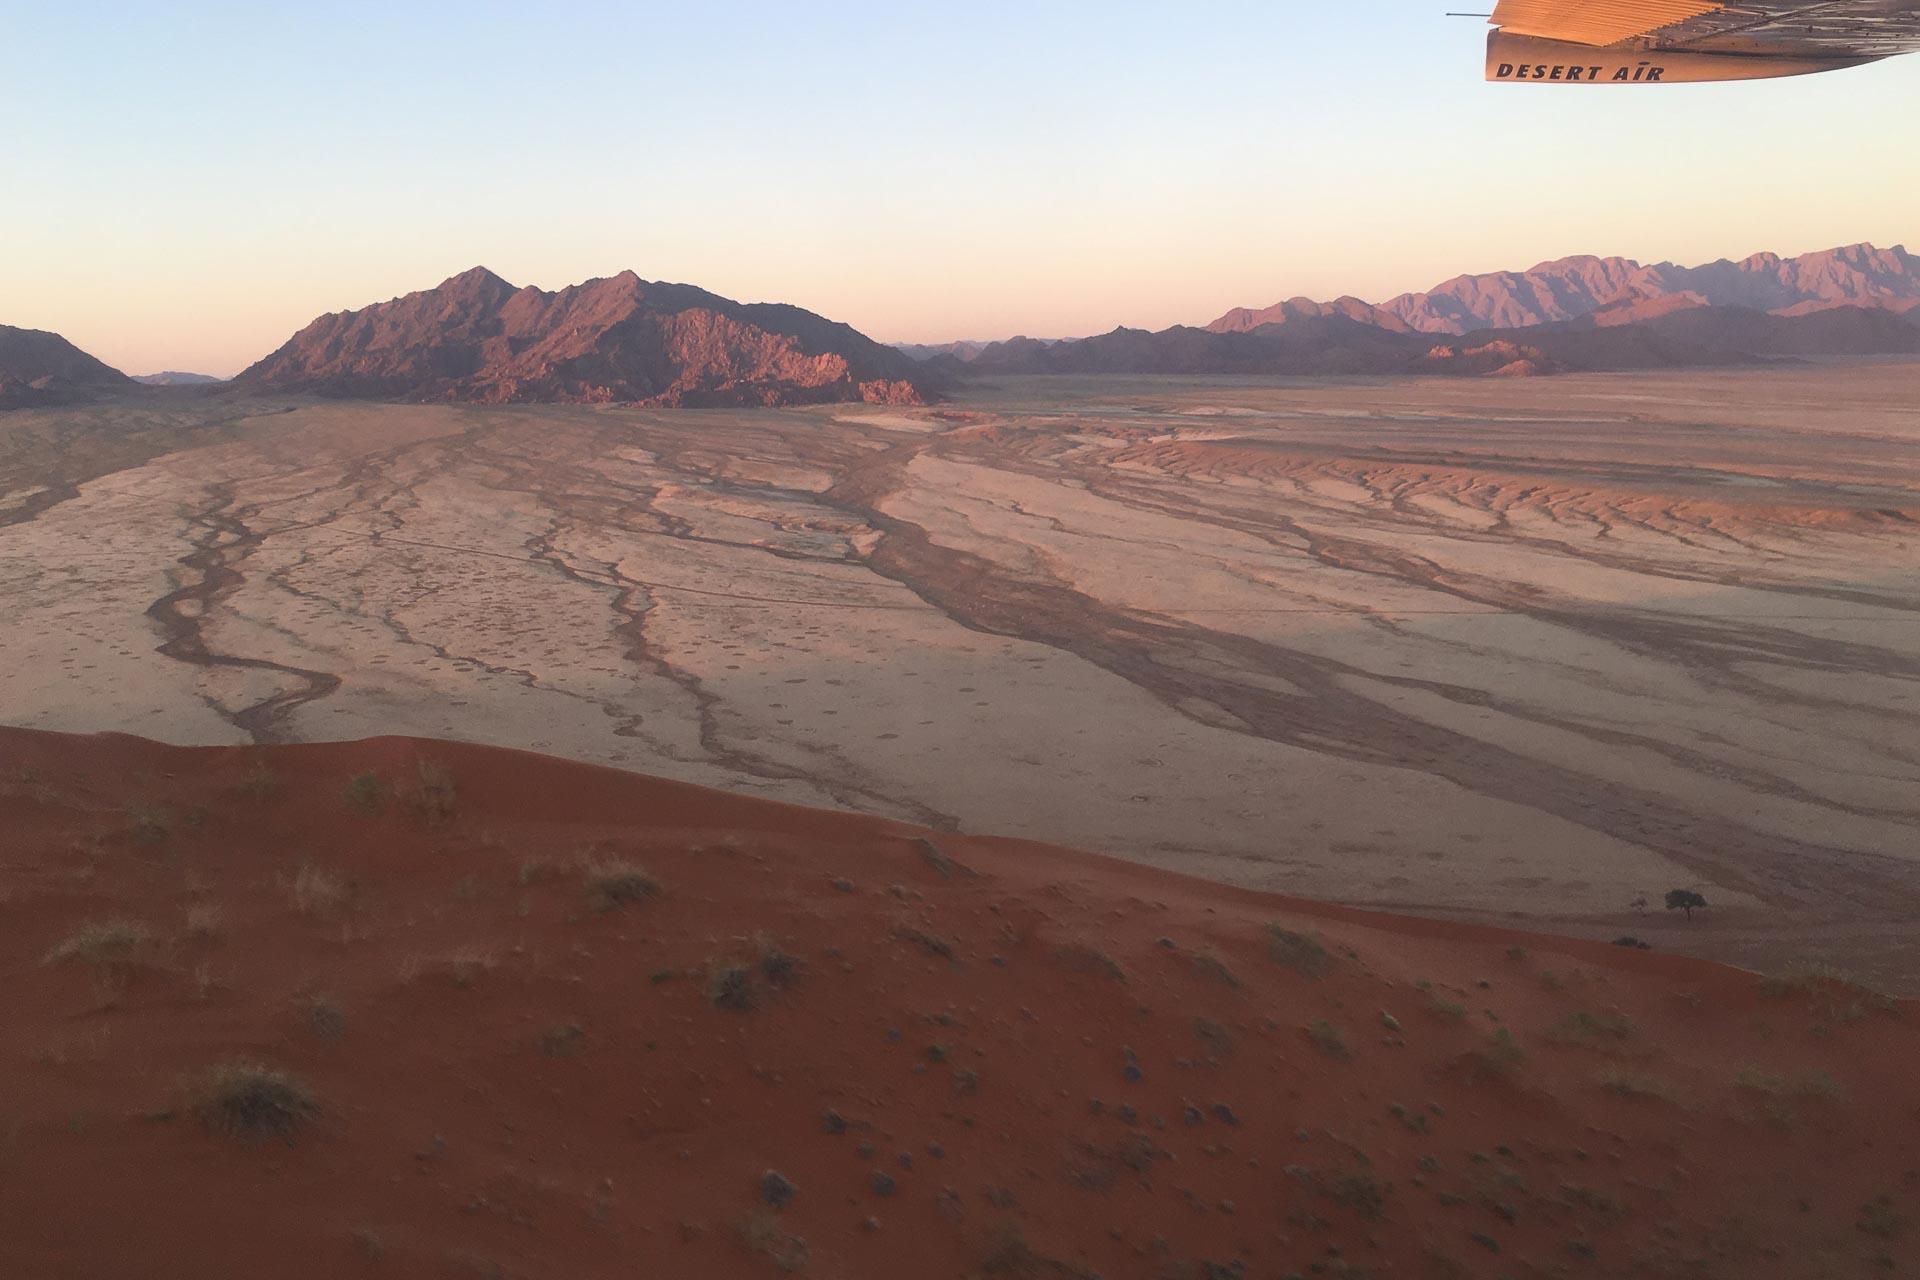 Sossusvlei-Namib-Naukluft-Namibia-Globetrotter-Select-511